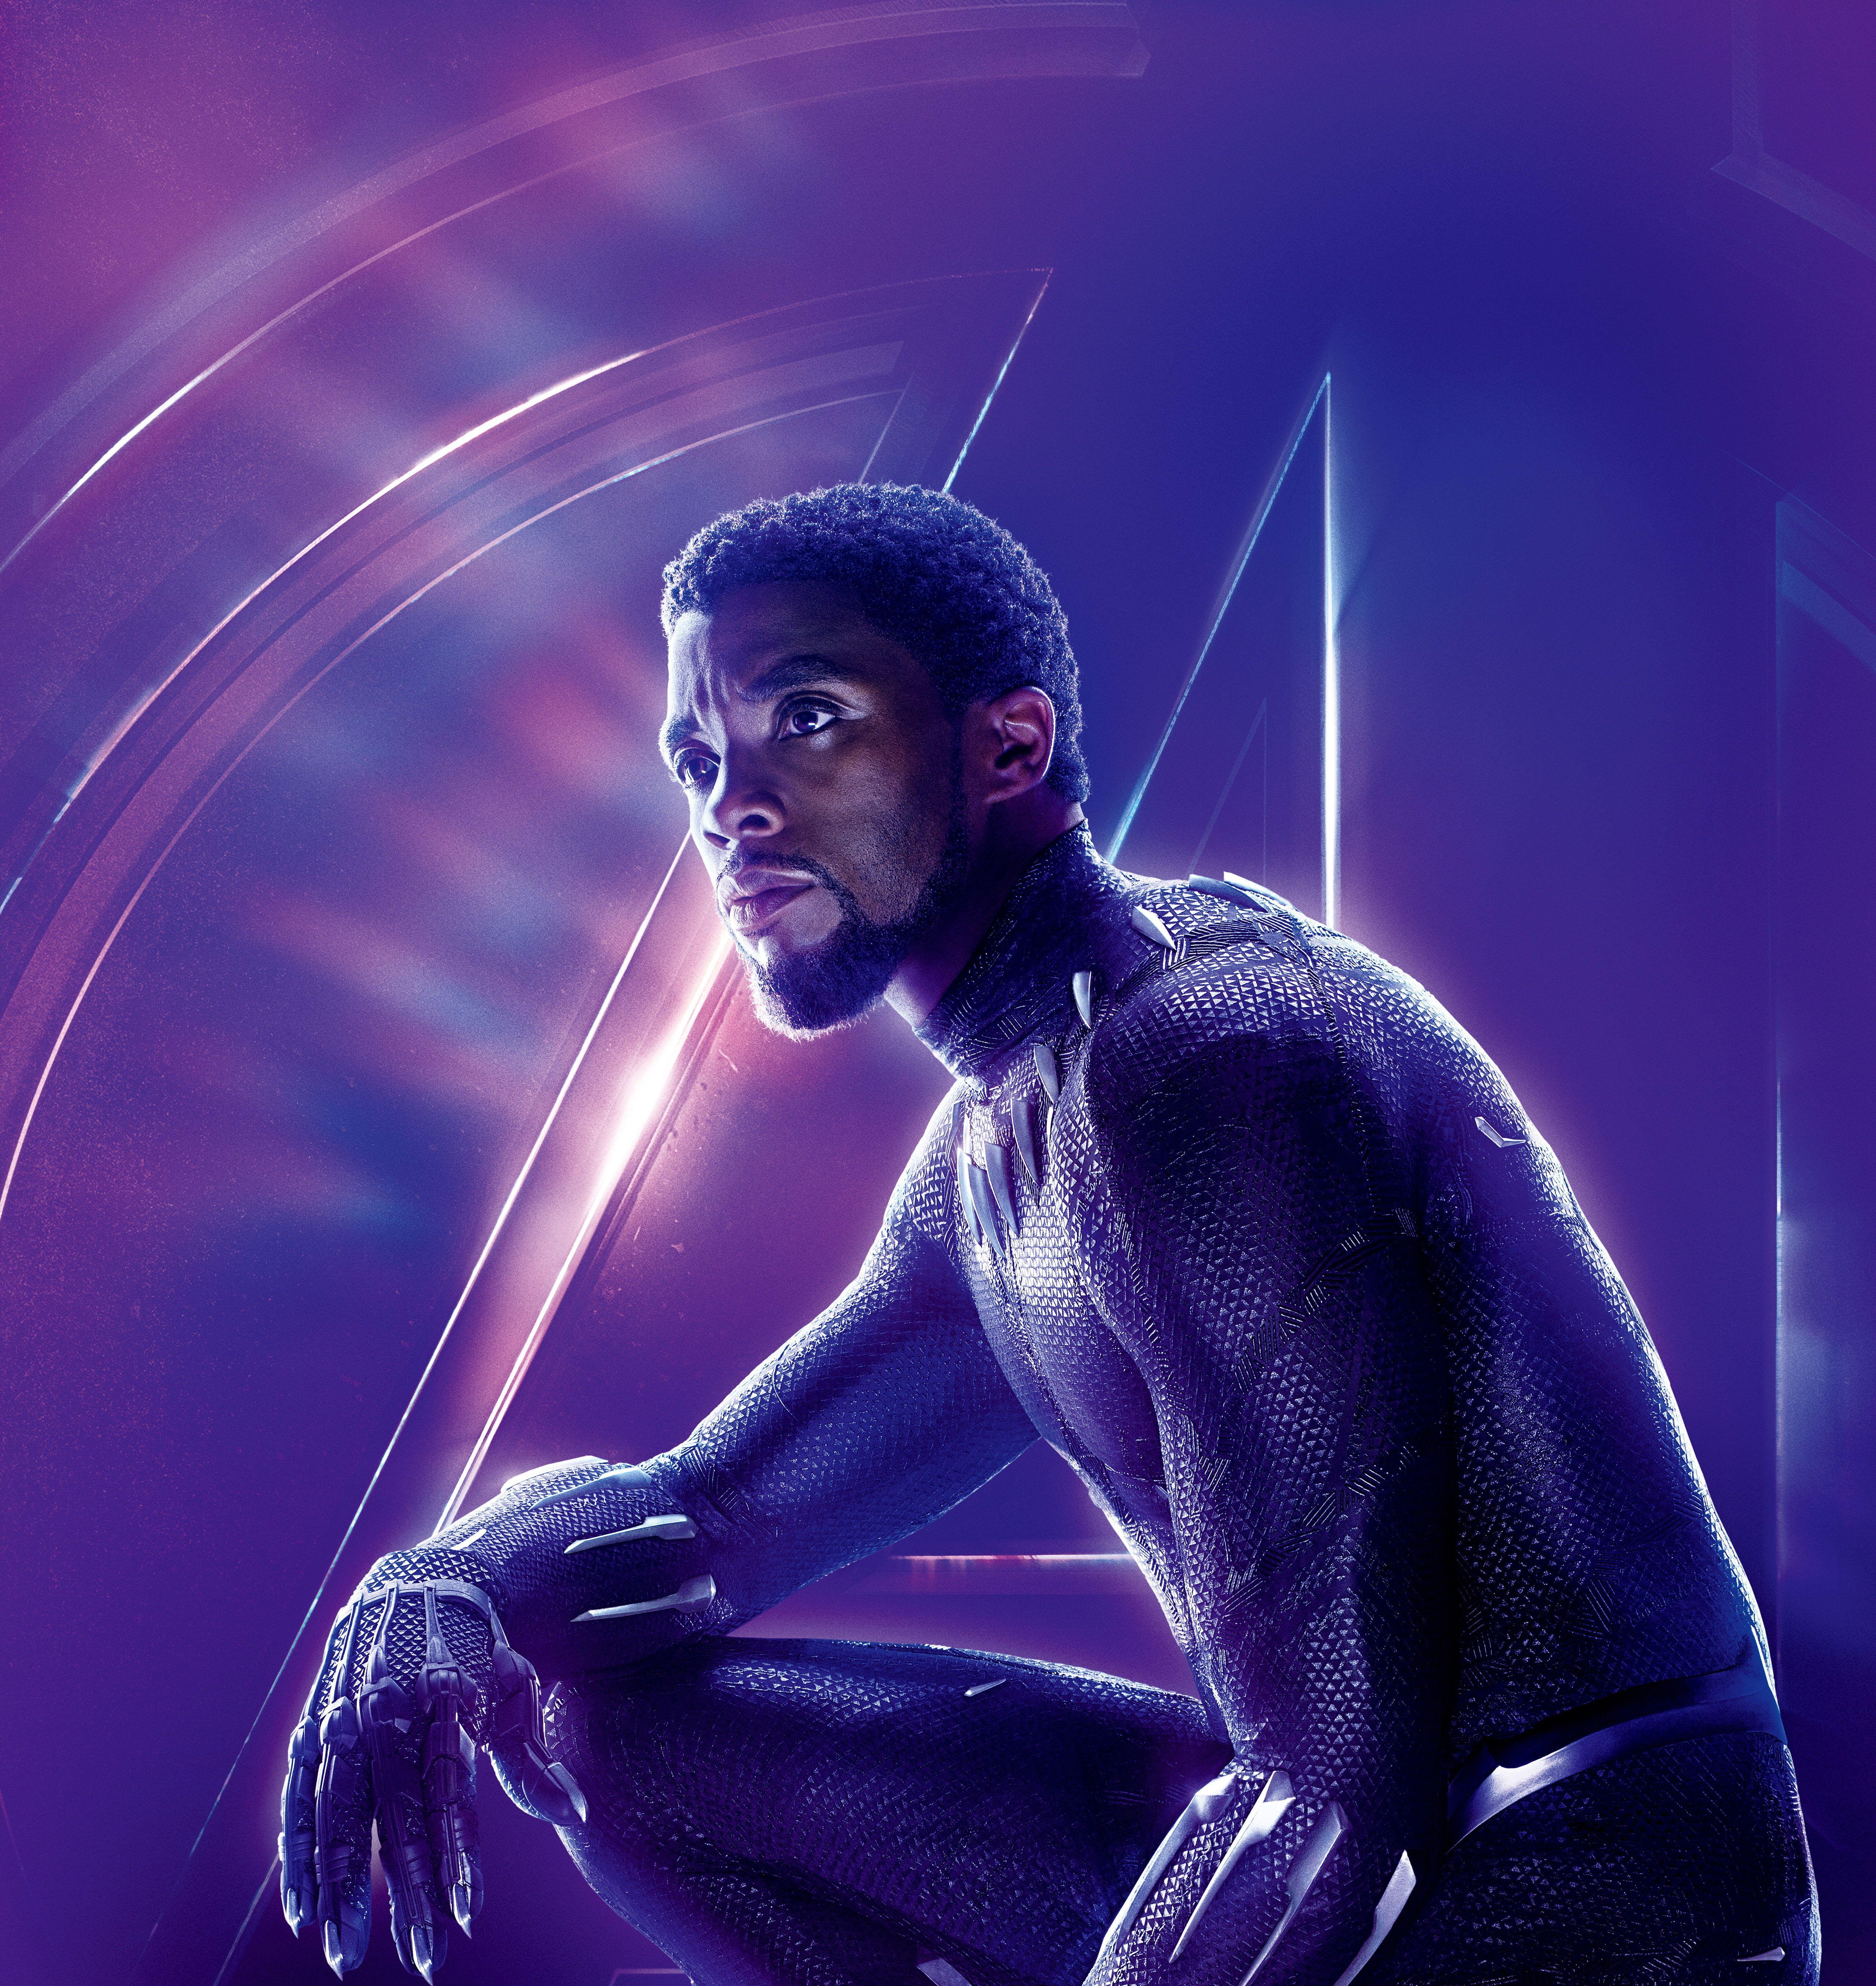 Chadwick Boseman Black Panther Phone Wallpapers Wallpaper Cave